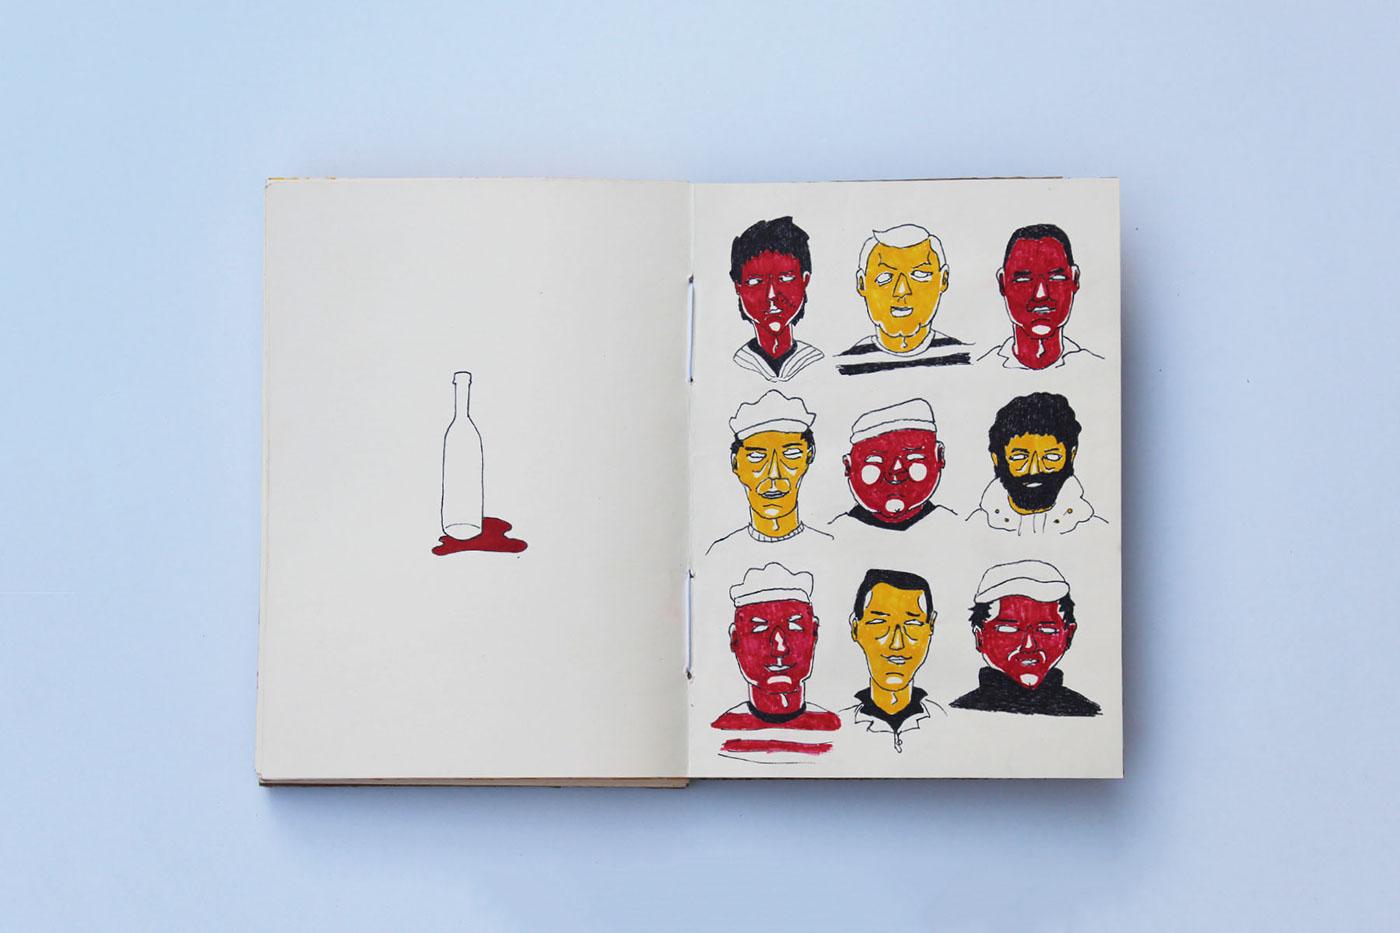 Sailor marujo drunken sailor livro ilustrado Illustrated book Sea Shanty celeuma música popular drunk sea